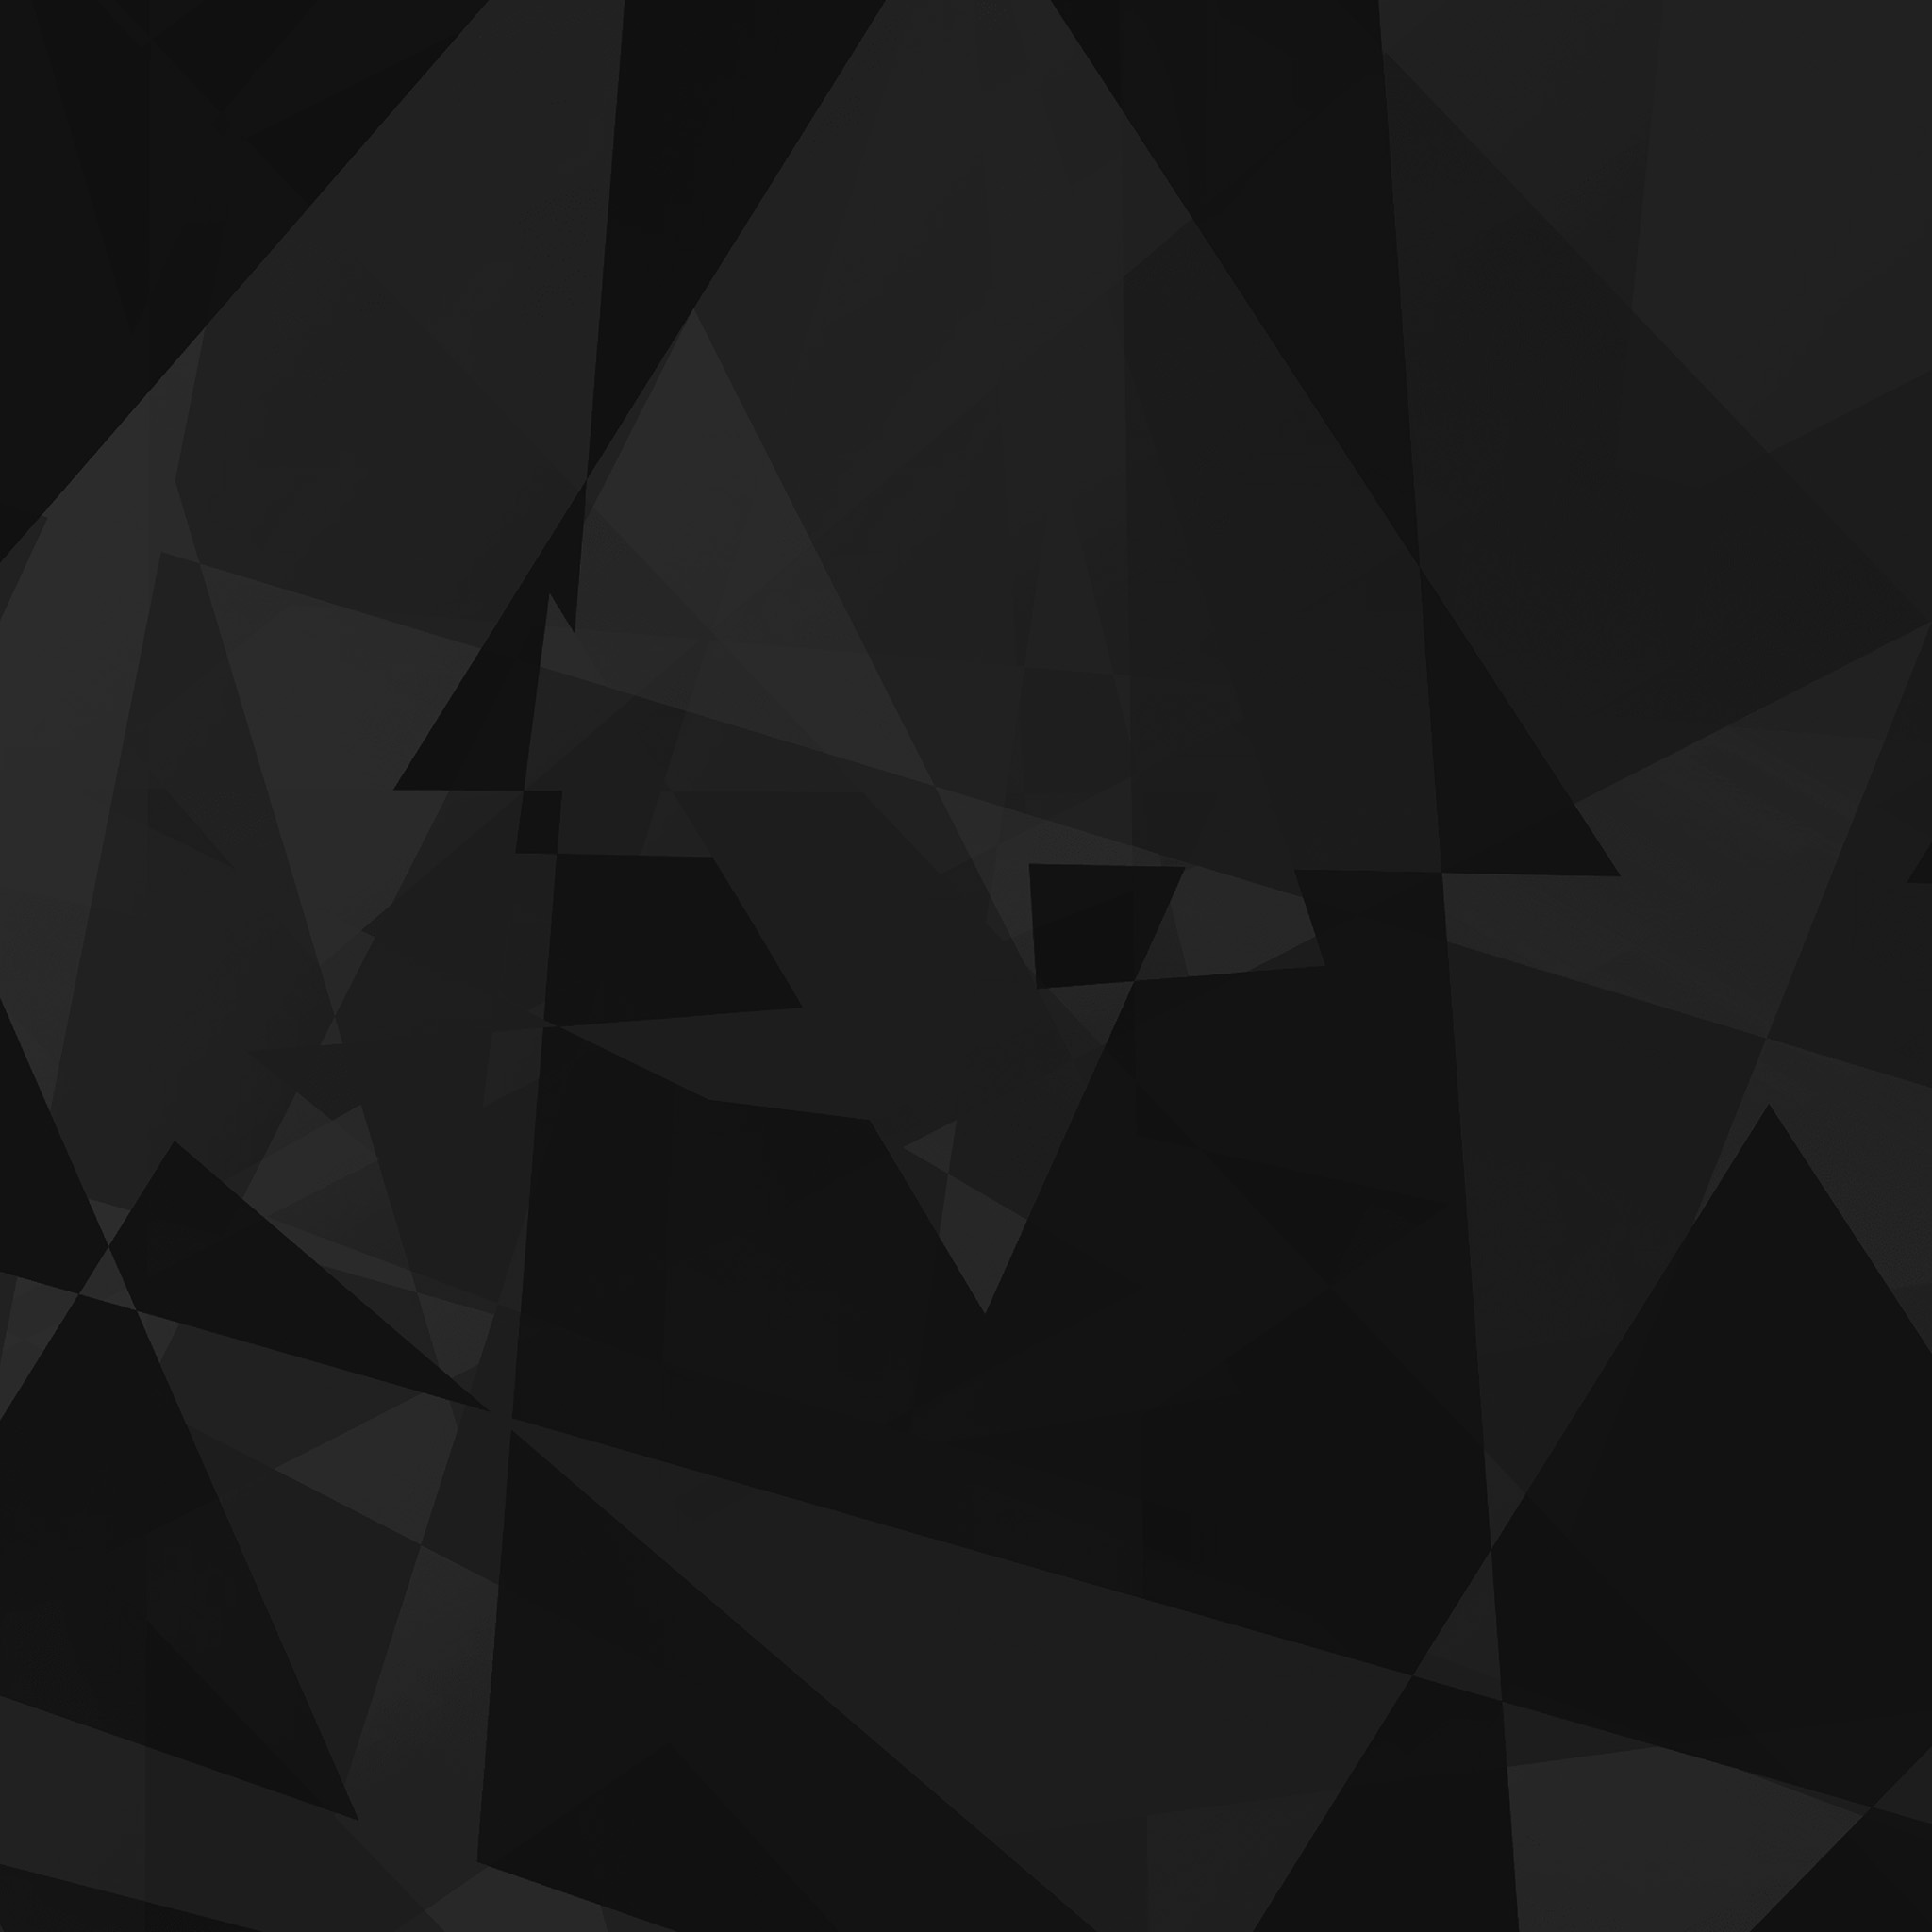 Vk58 Abstract Polyart Dark Bw Pattern